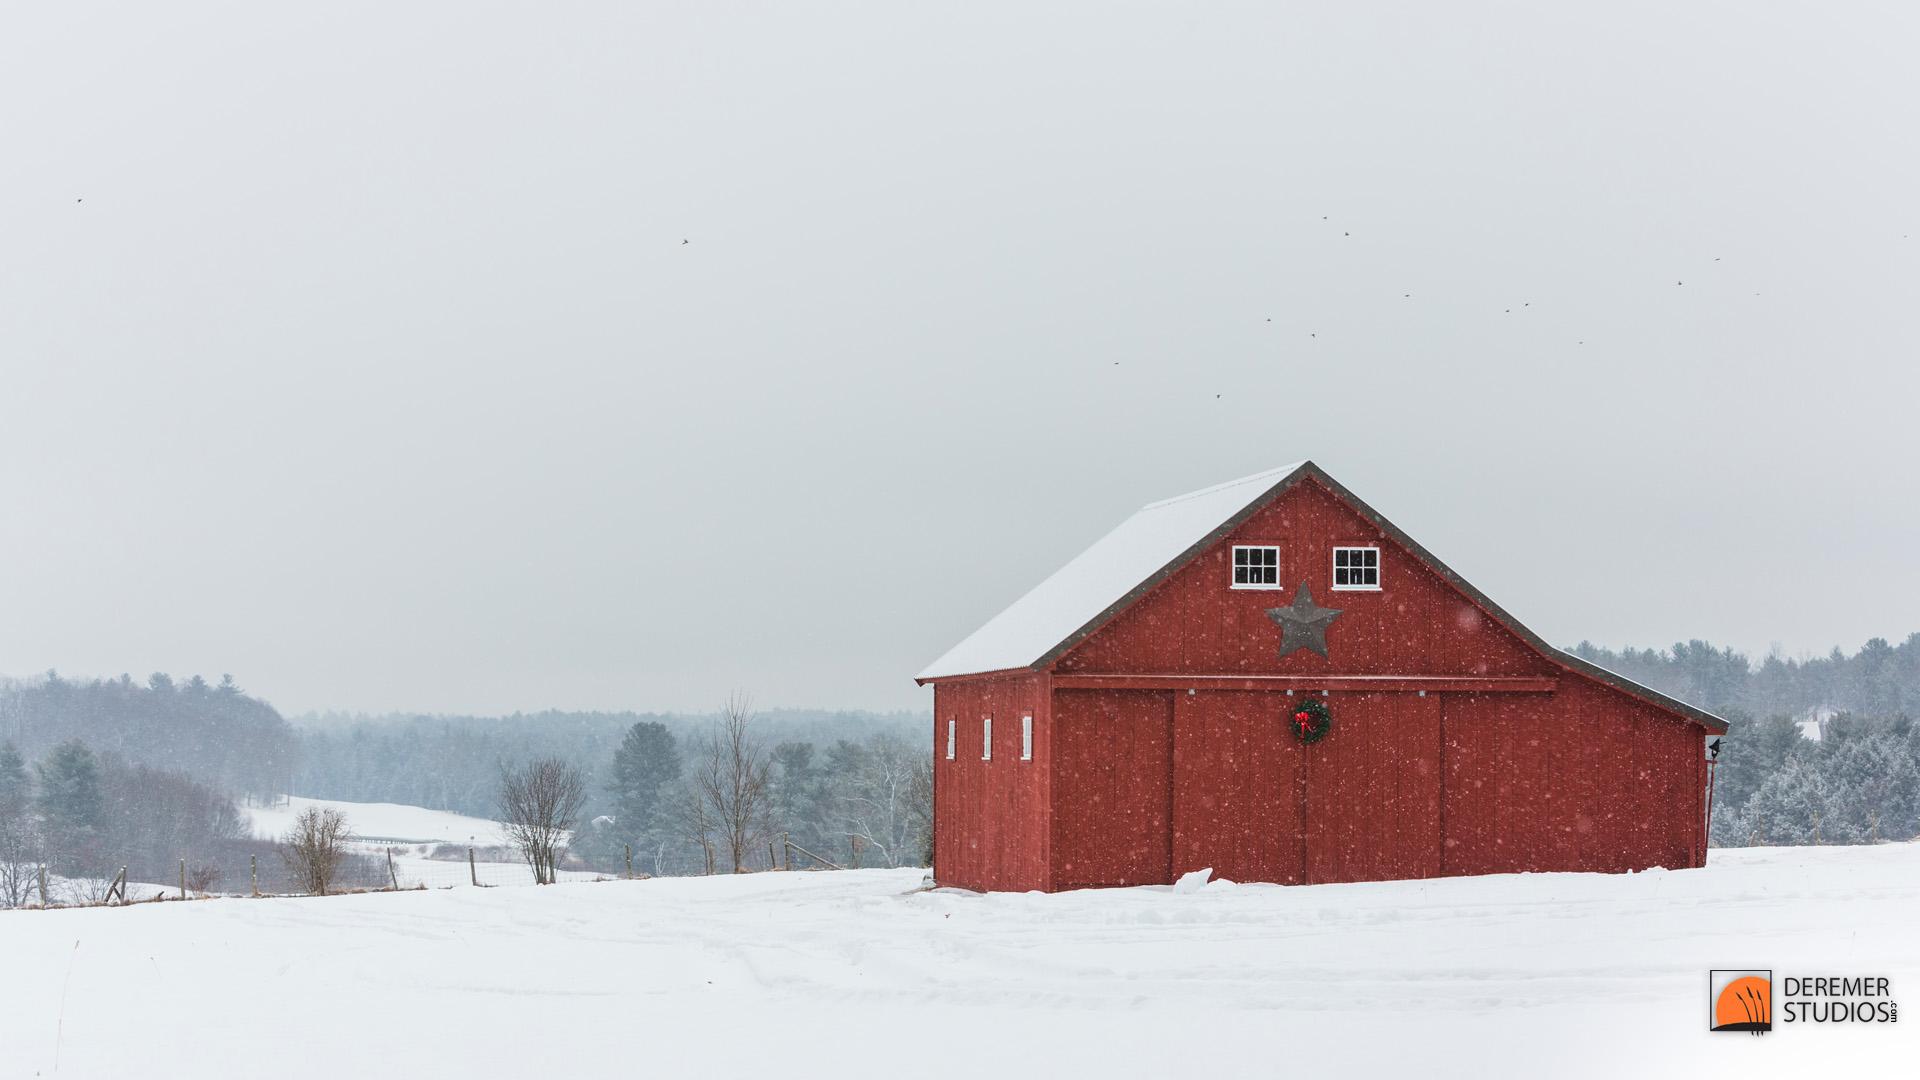 Fall Coastal Desktop Wallpaper Up North Fine Art Shoots From North Of Fl A Snowy